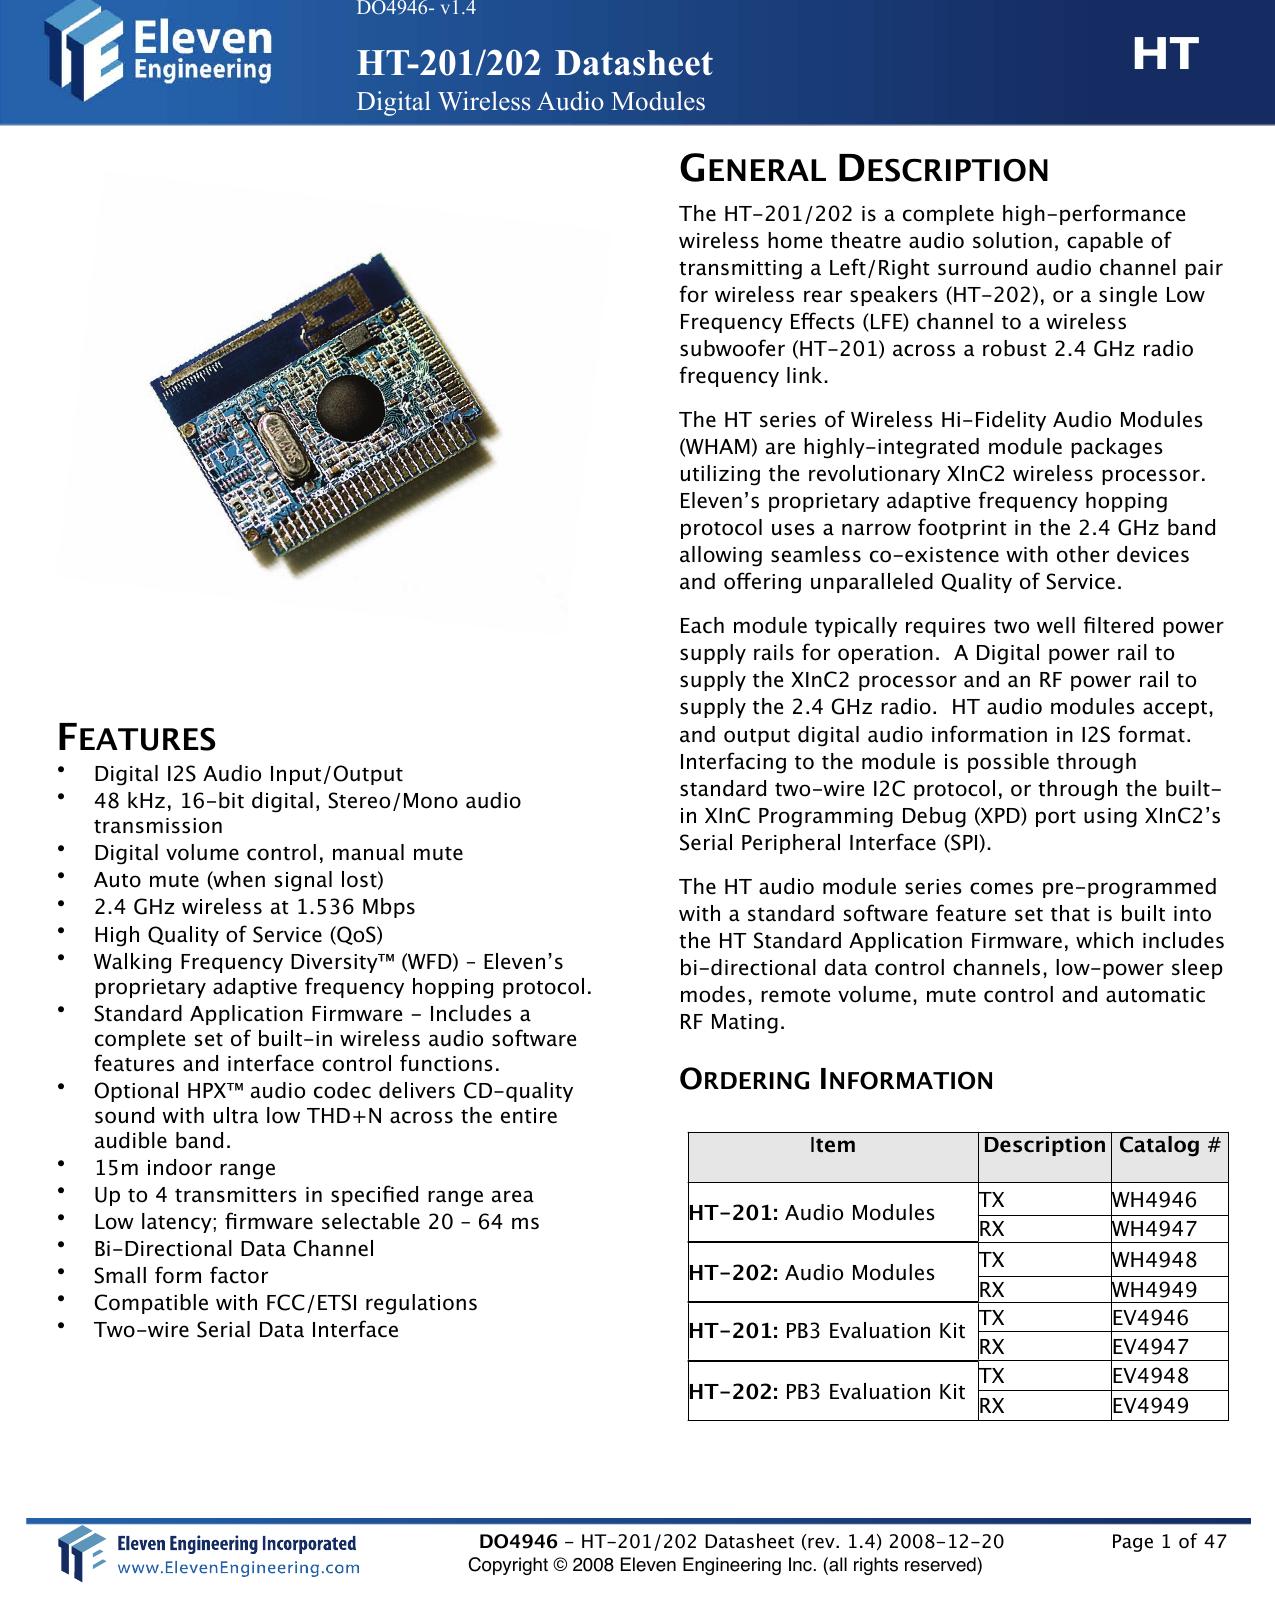 Paradigm Electronics HT205 WIRELESS POWERED SUBWOOFER